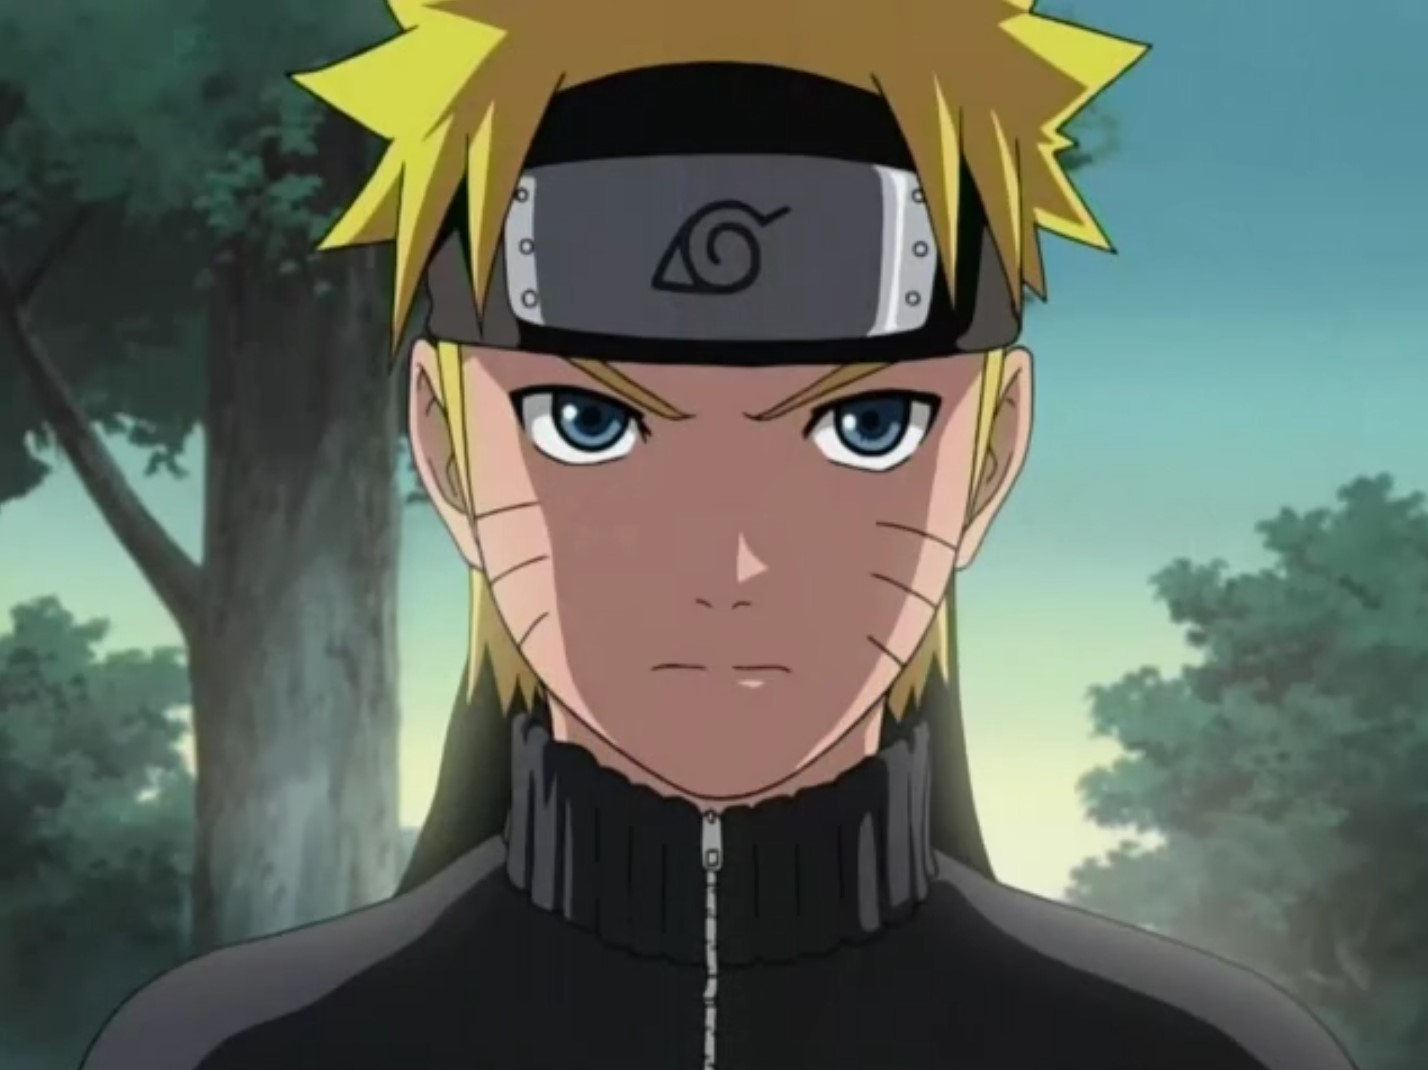 Naruto Shippuden: Episódio 10 – Jutsu de Selamento: Nove Dragões Fantasmas